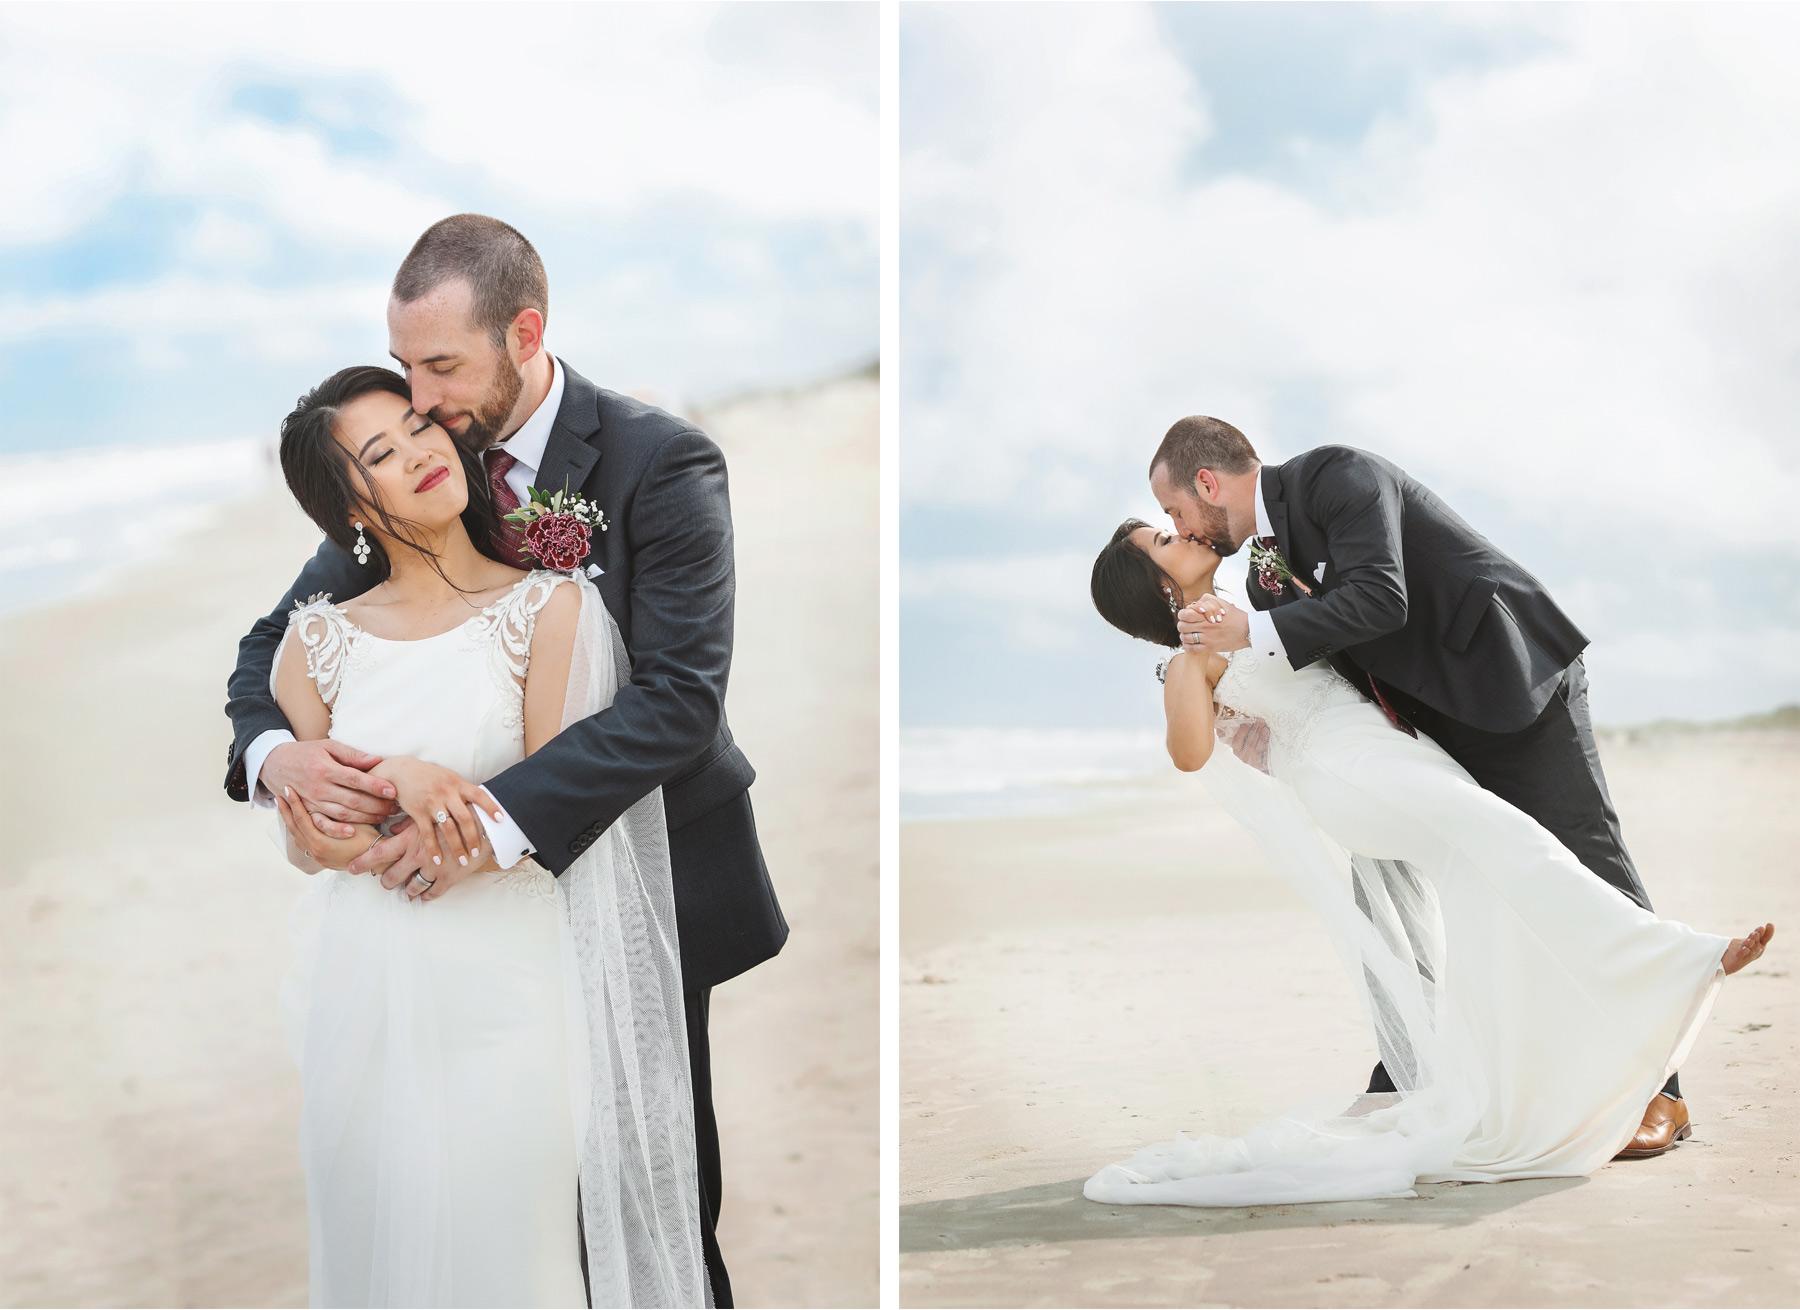 19-South-Carolina-Wedding-by-Vick-Photography-Hilton-Head-Island-Omni-Oceanfront-Hotel-Destination-Beach-Ocean-Bride-Groom-Sand-Felyn-and-Will.jpg